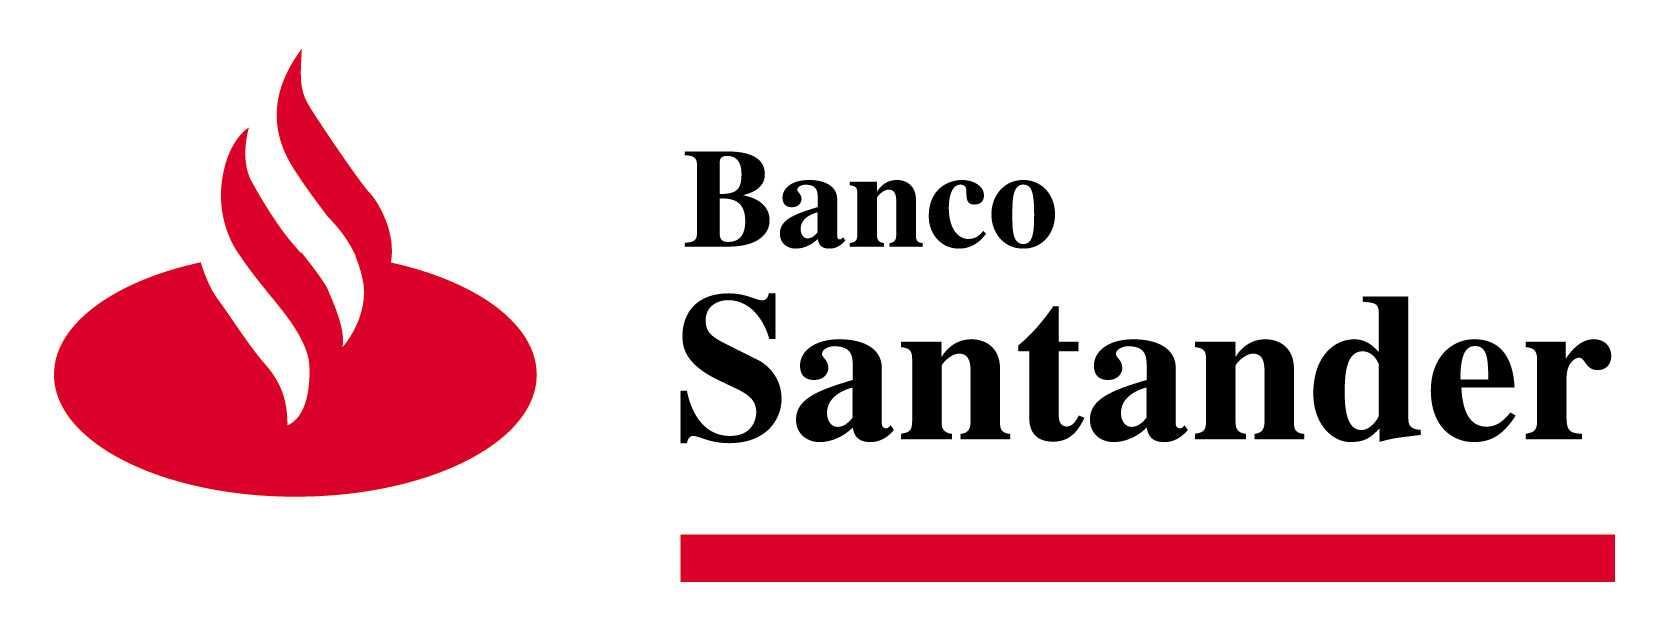 Banco Santander-Chile logo